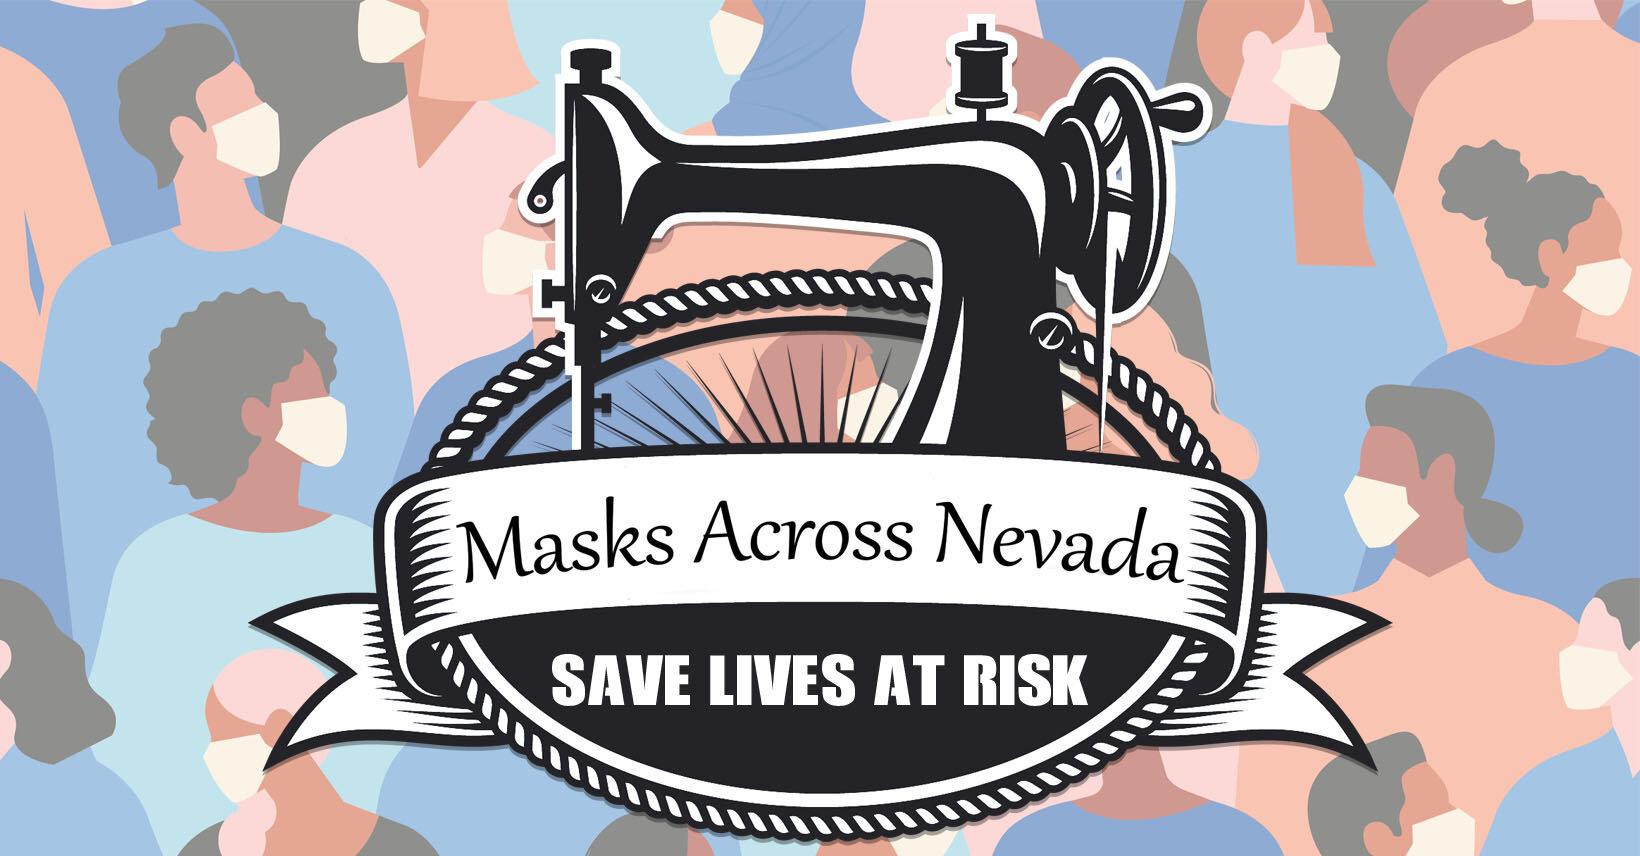 - Instructions courtesy of Masks Across Nevada, a partner organization